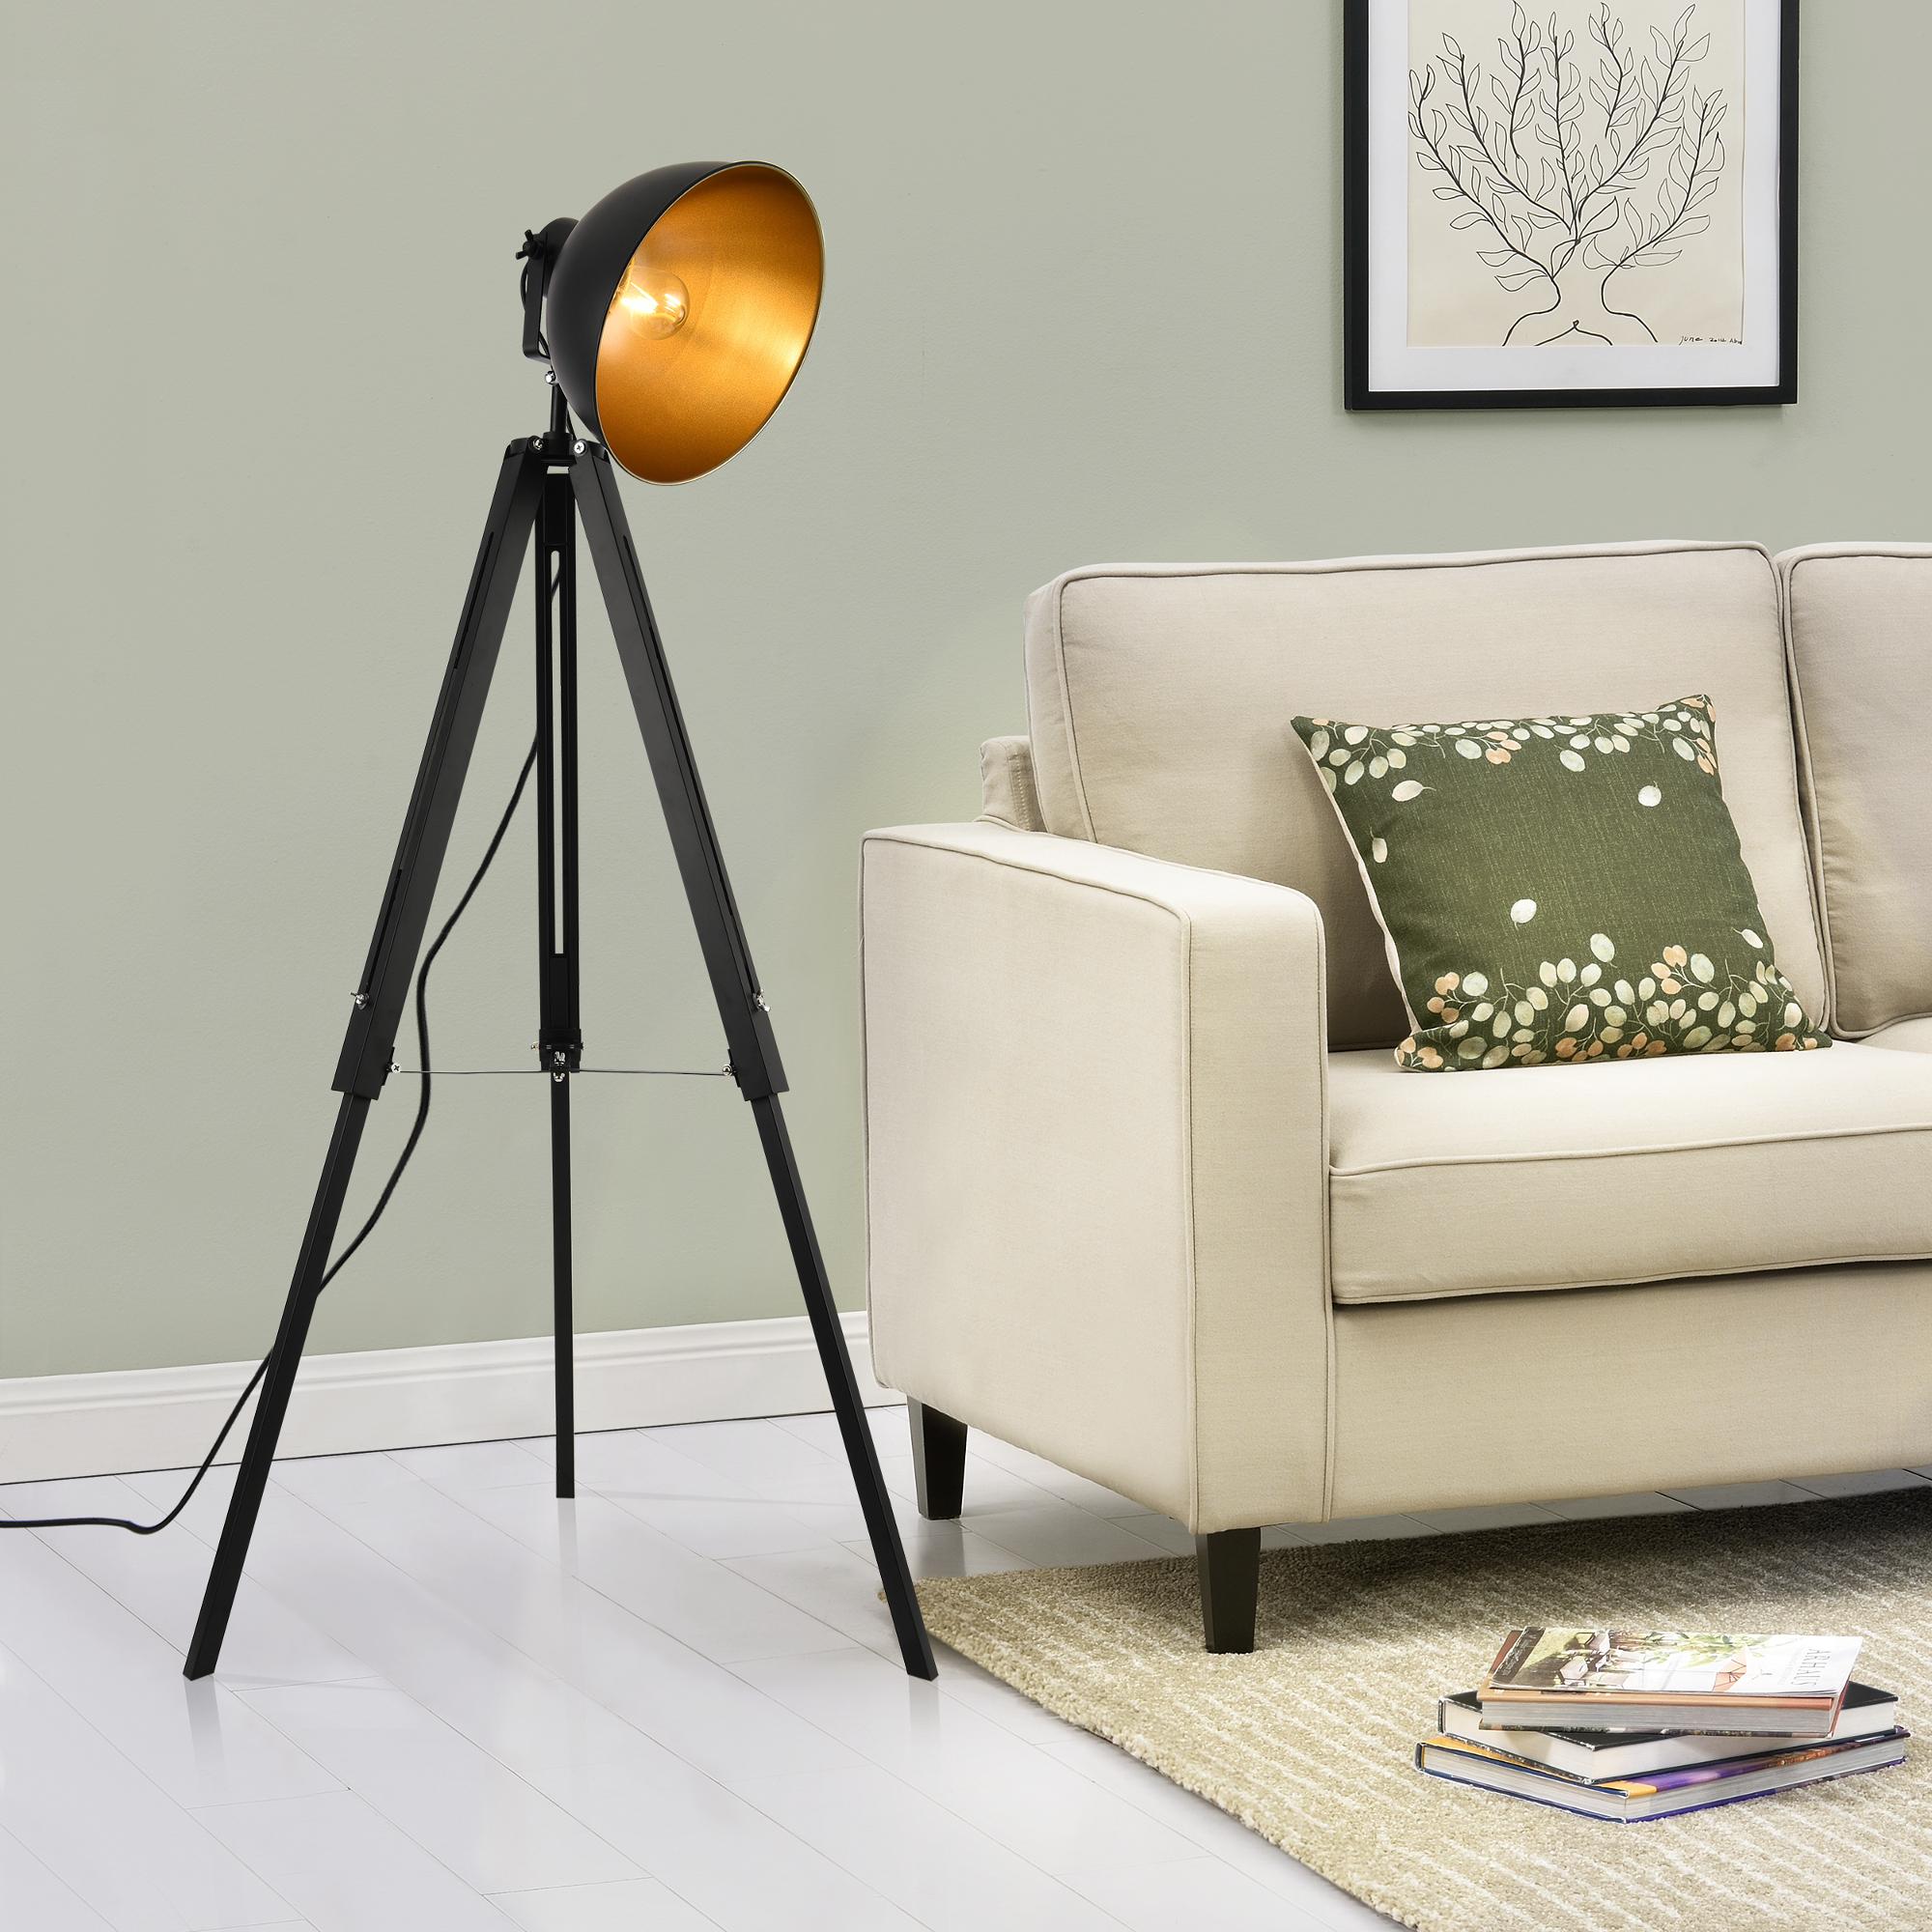 lampadaire tr pied avec abatjour design. Black Bedroom Furniture Sets. Home Design Ideas